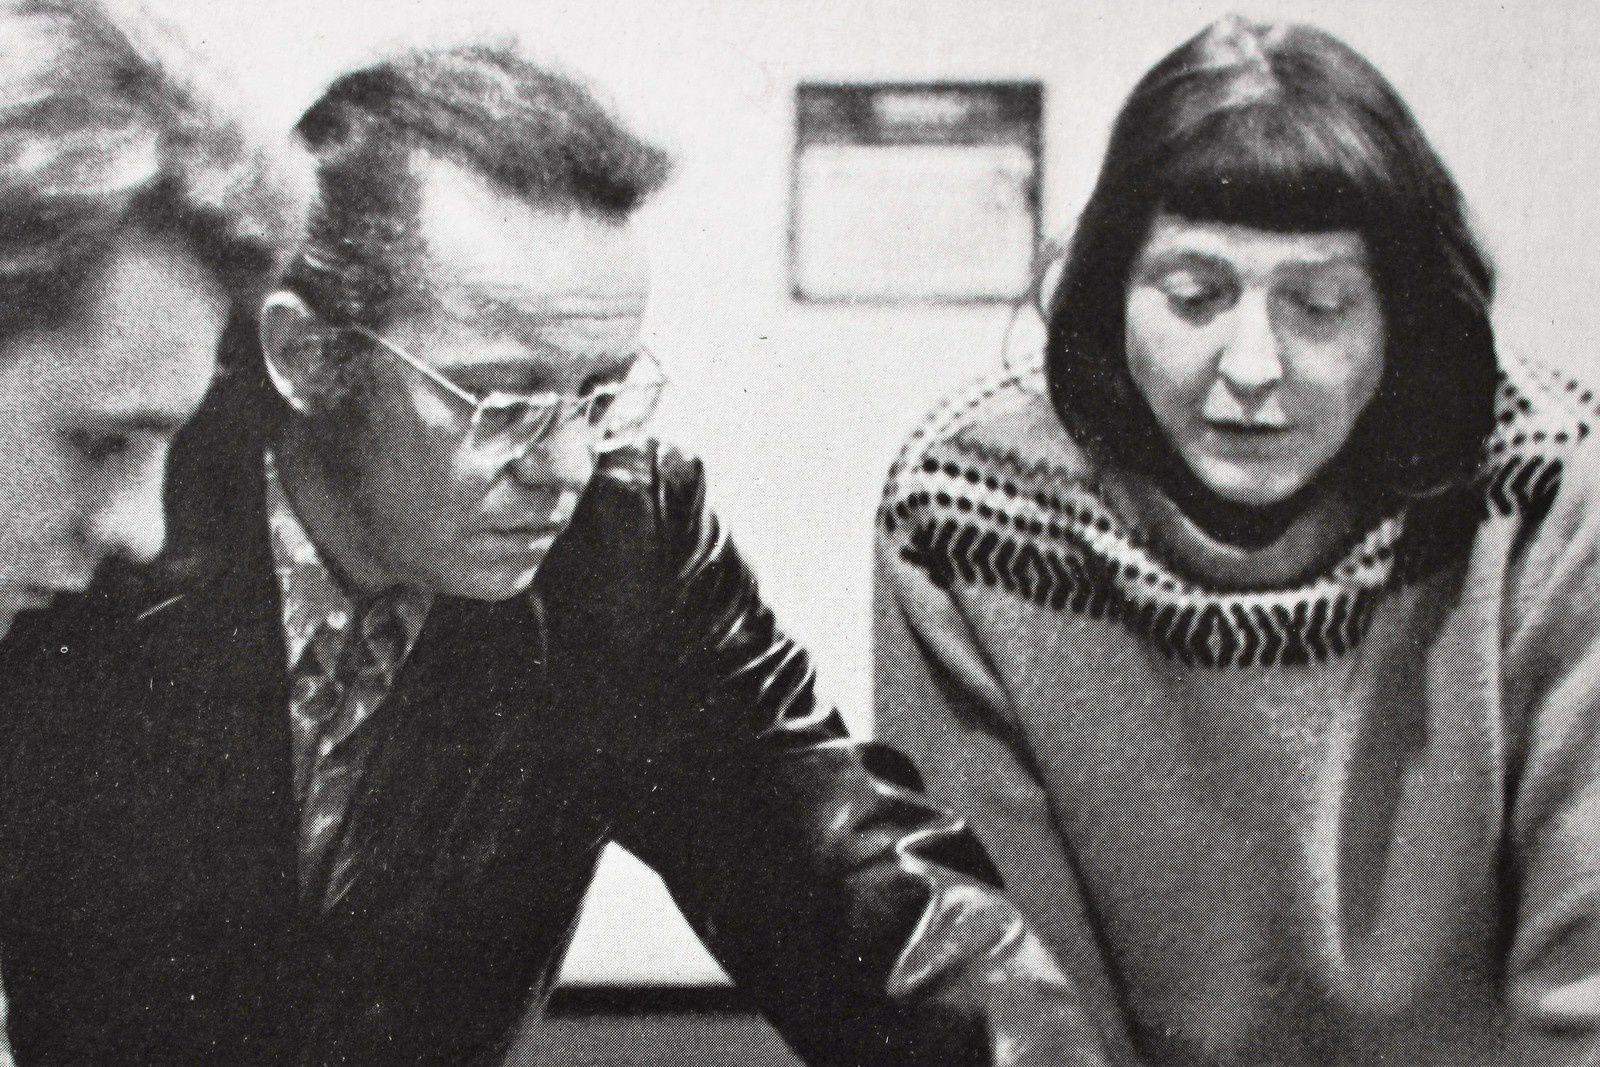 Morelli et Léonardi